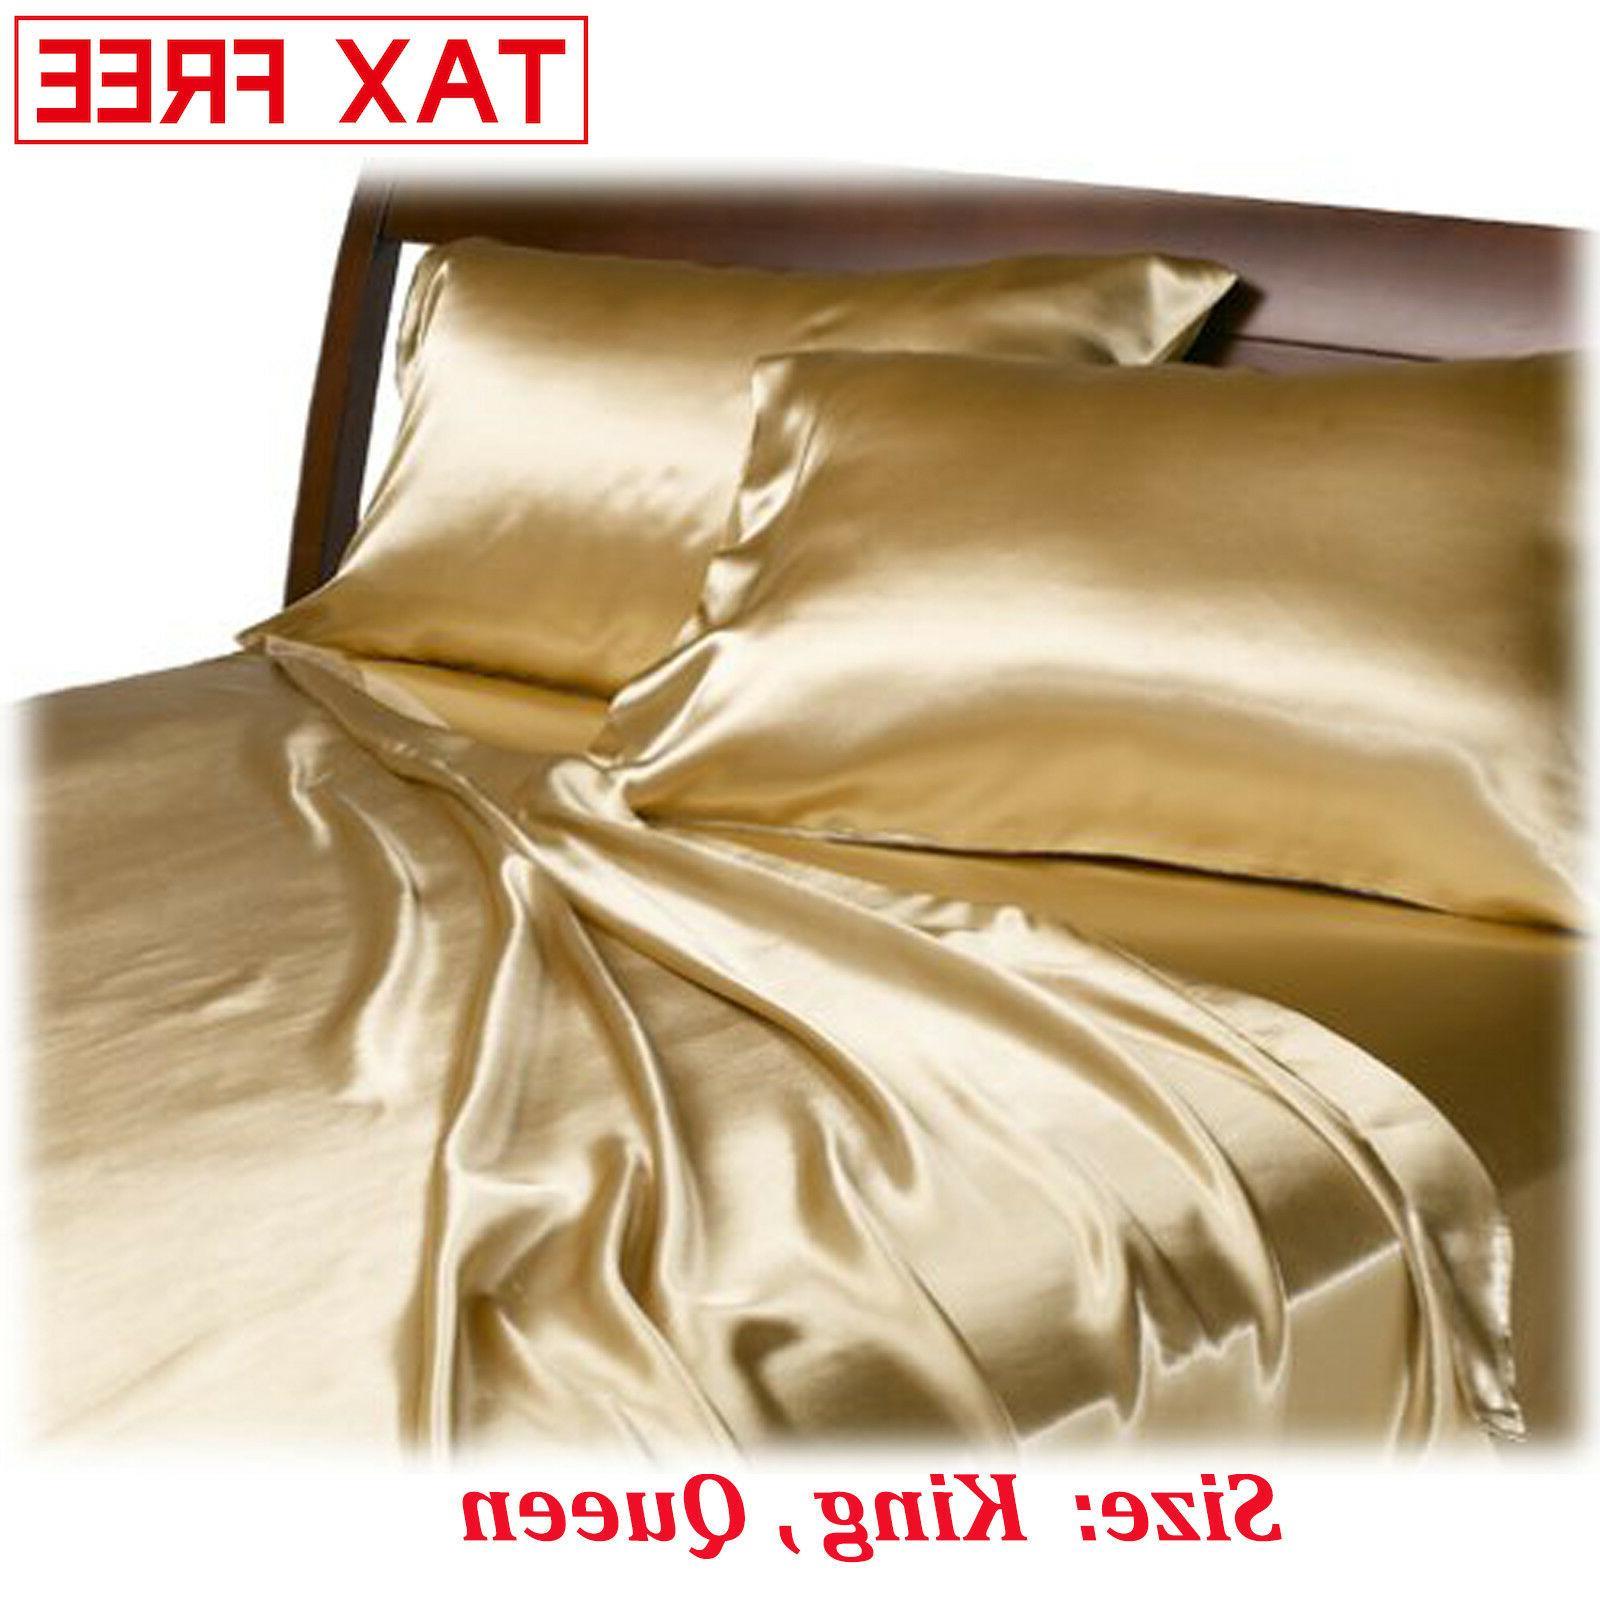 satin charmeuse sheet set queen king soft